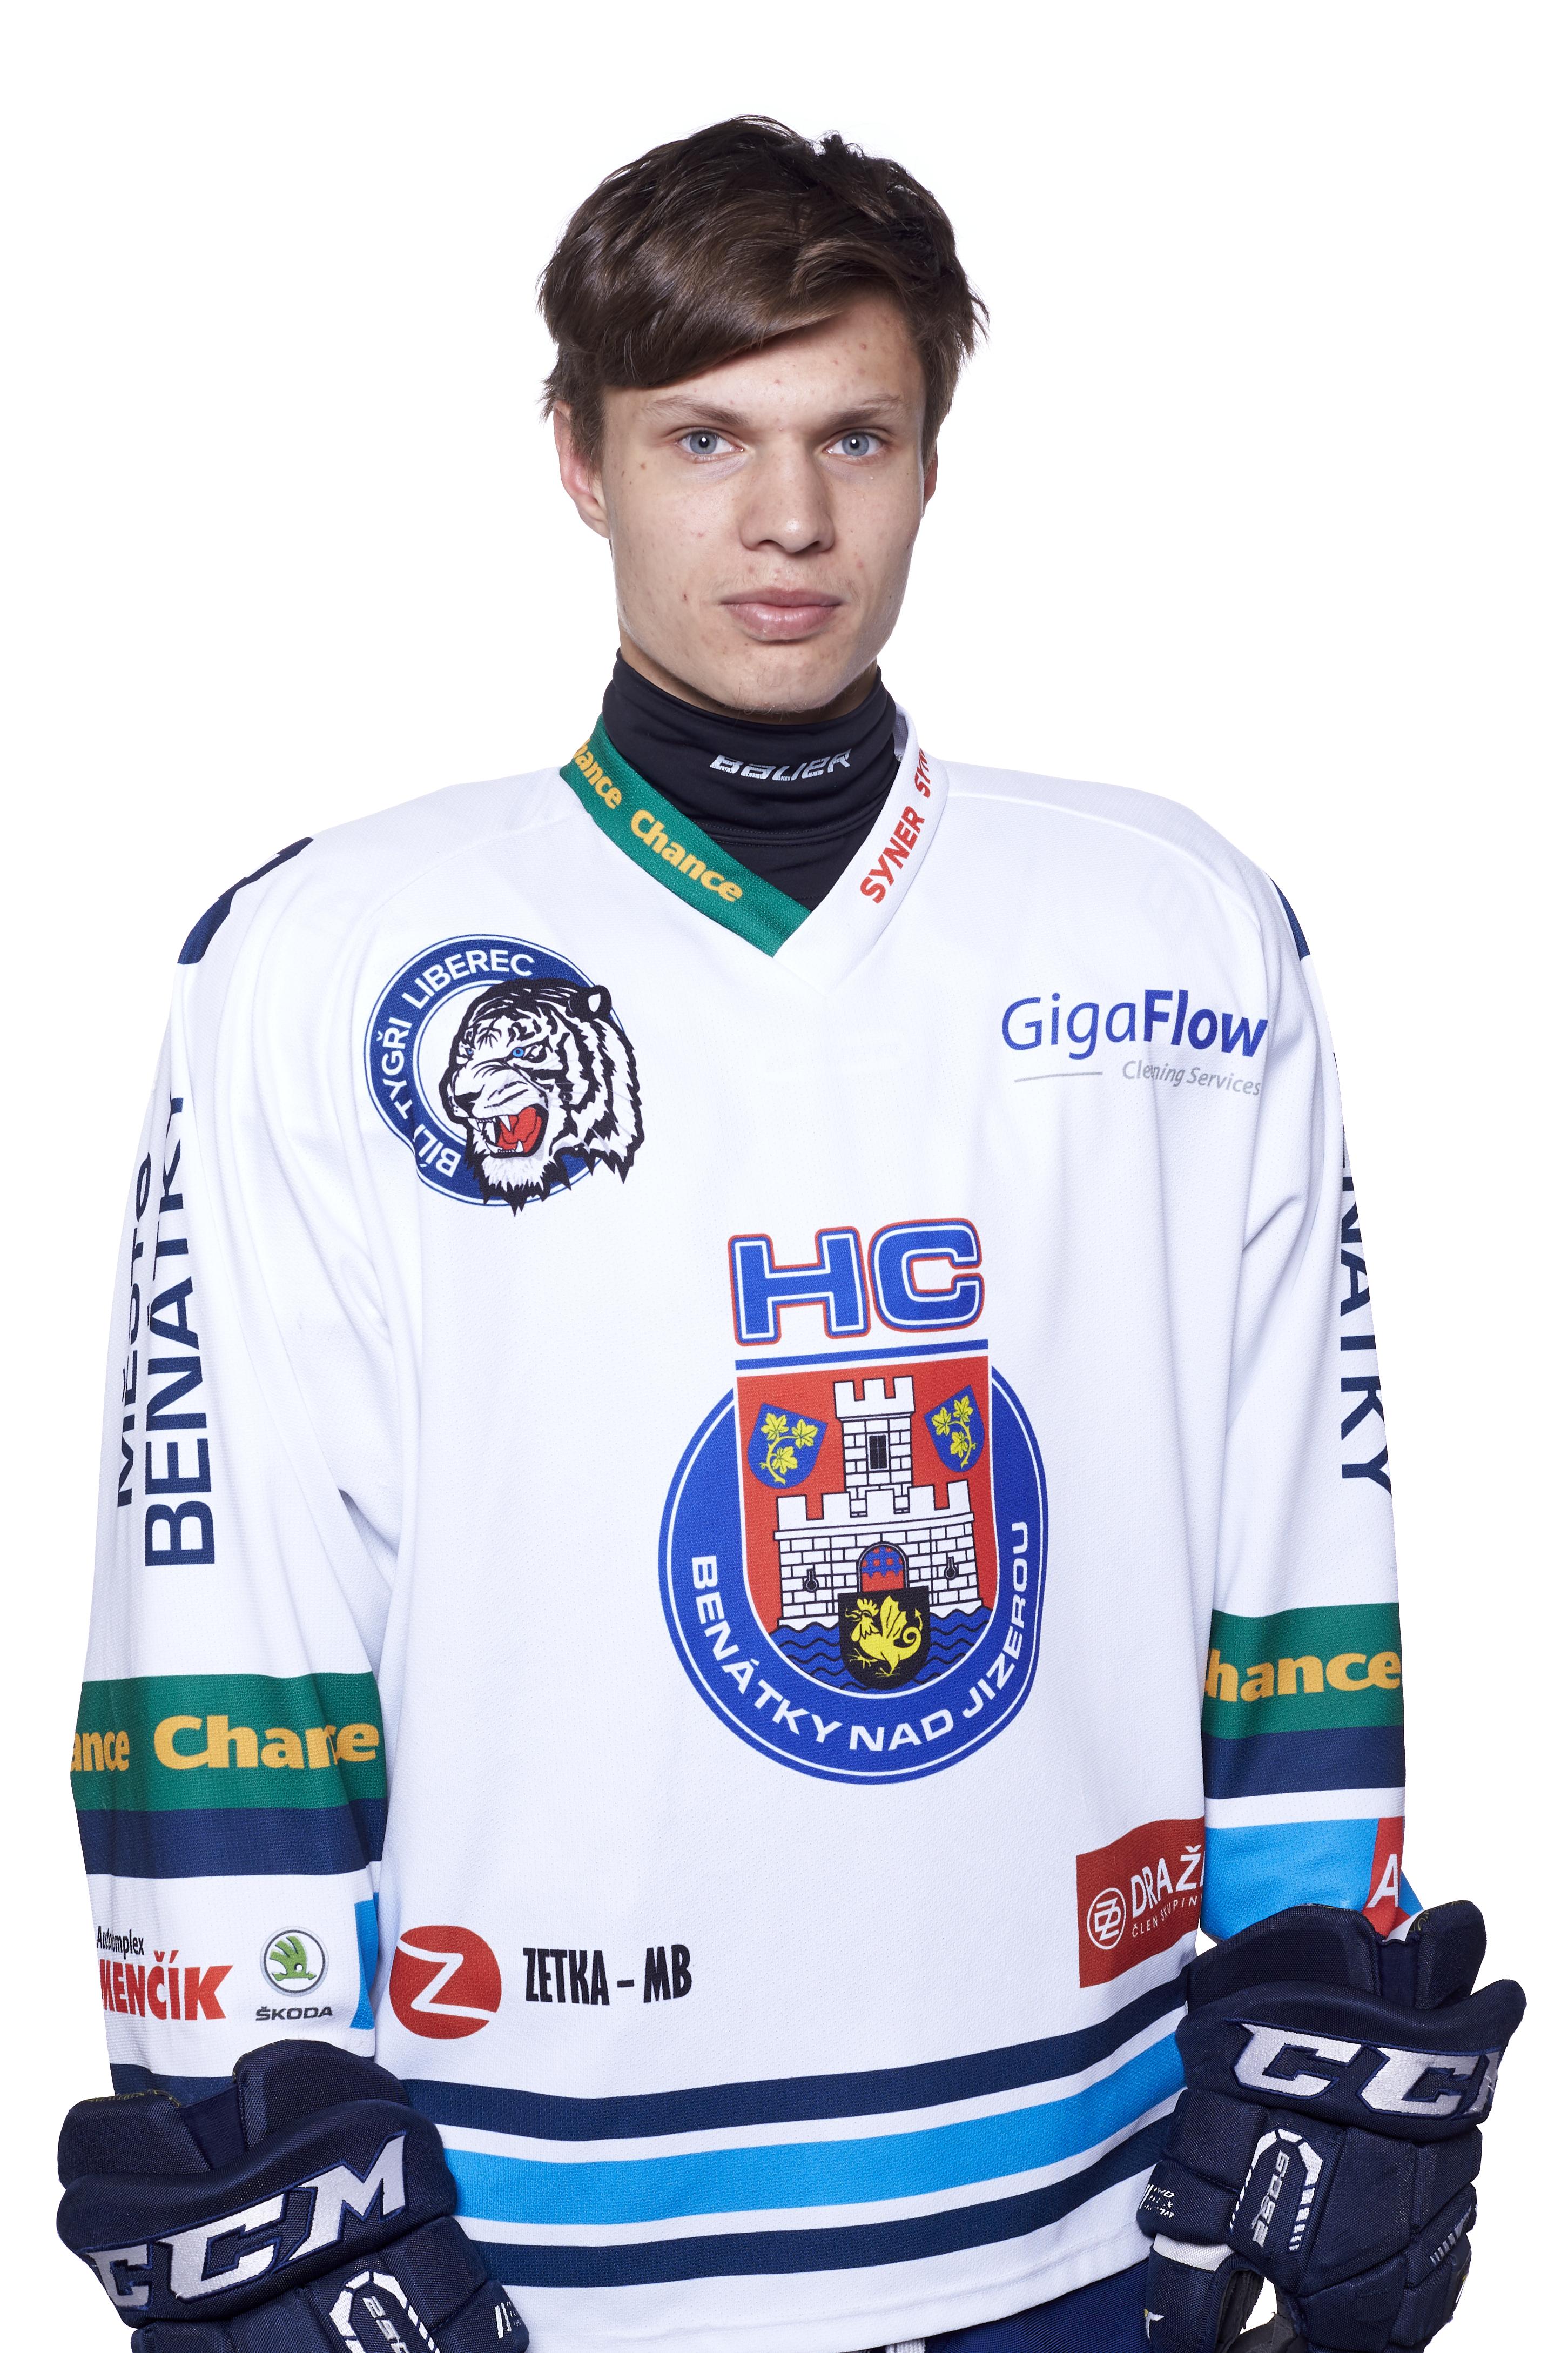 Petr Had #21